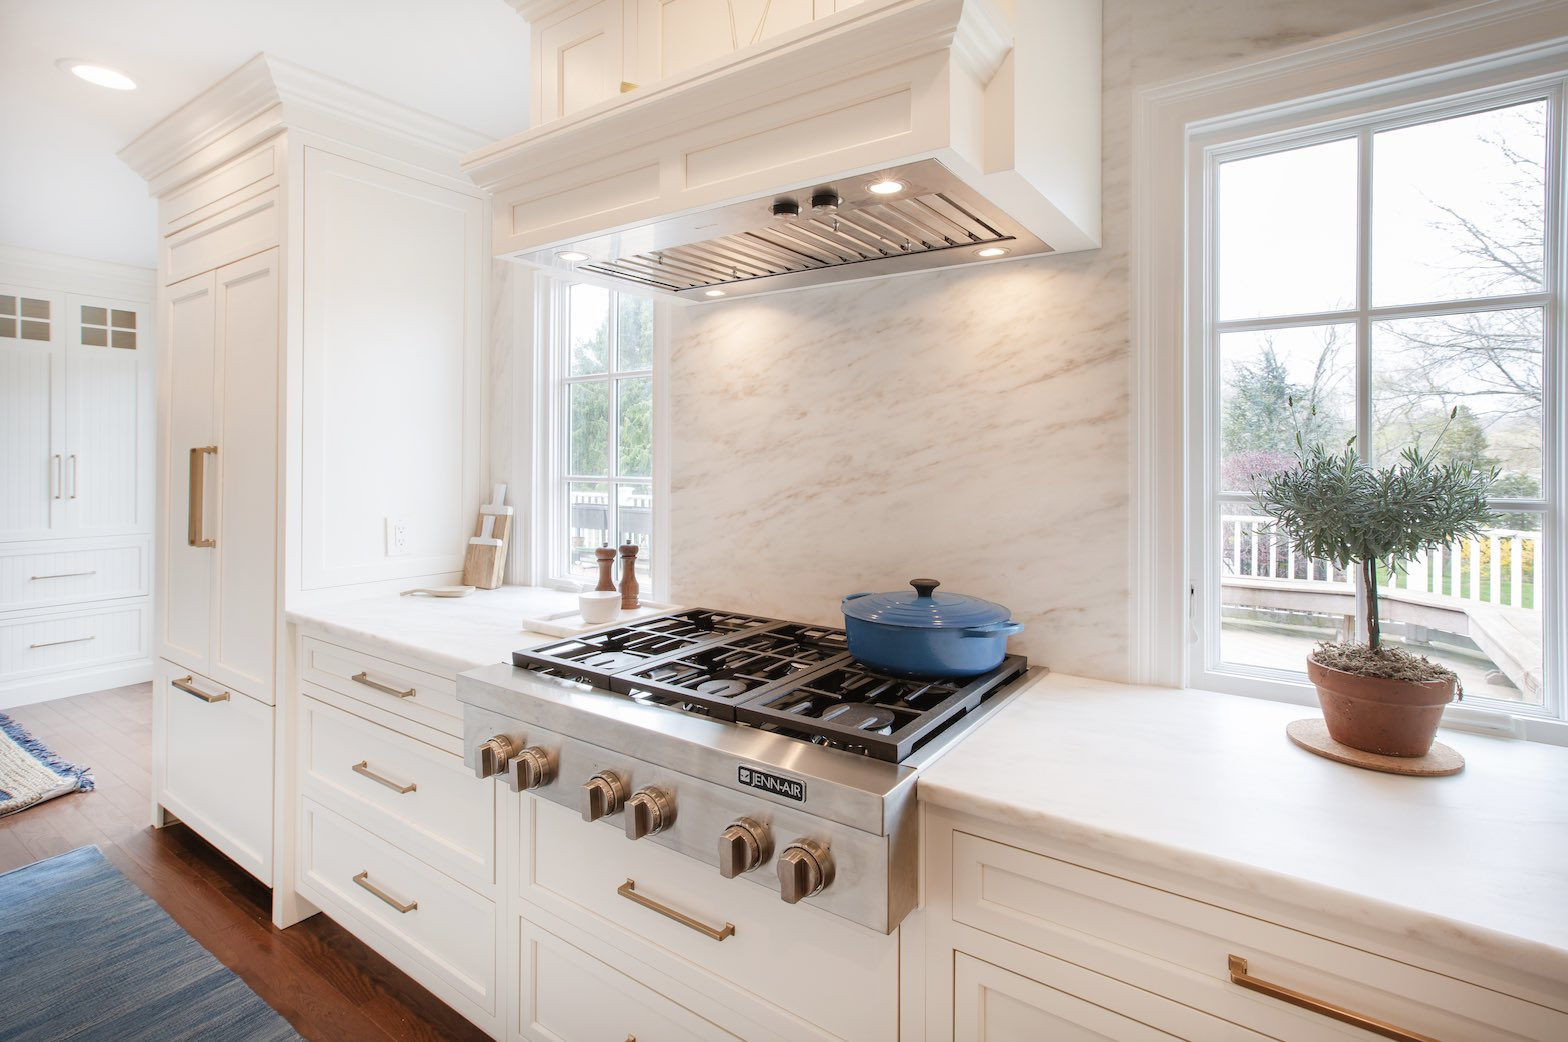 cooktop-rangetop-style